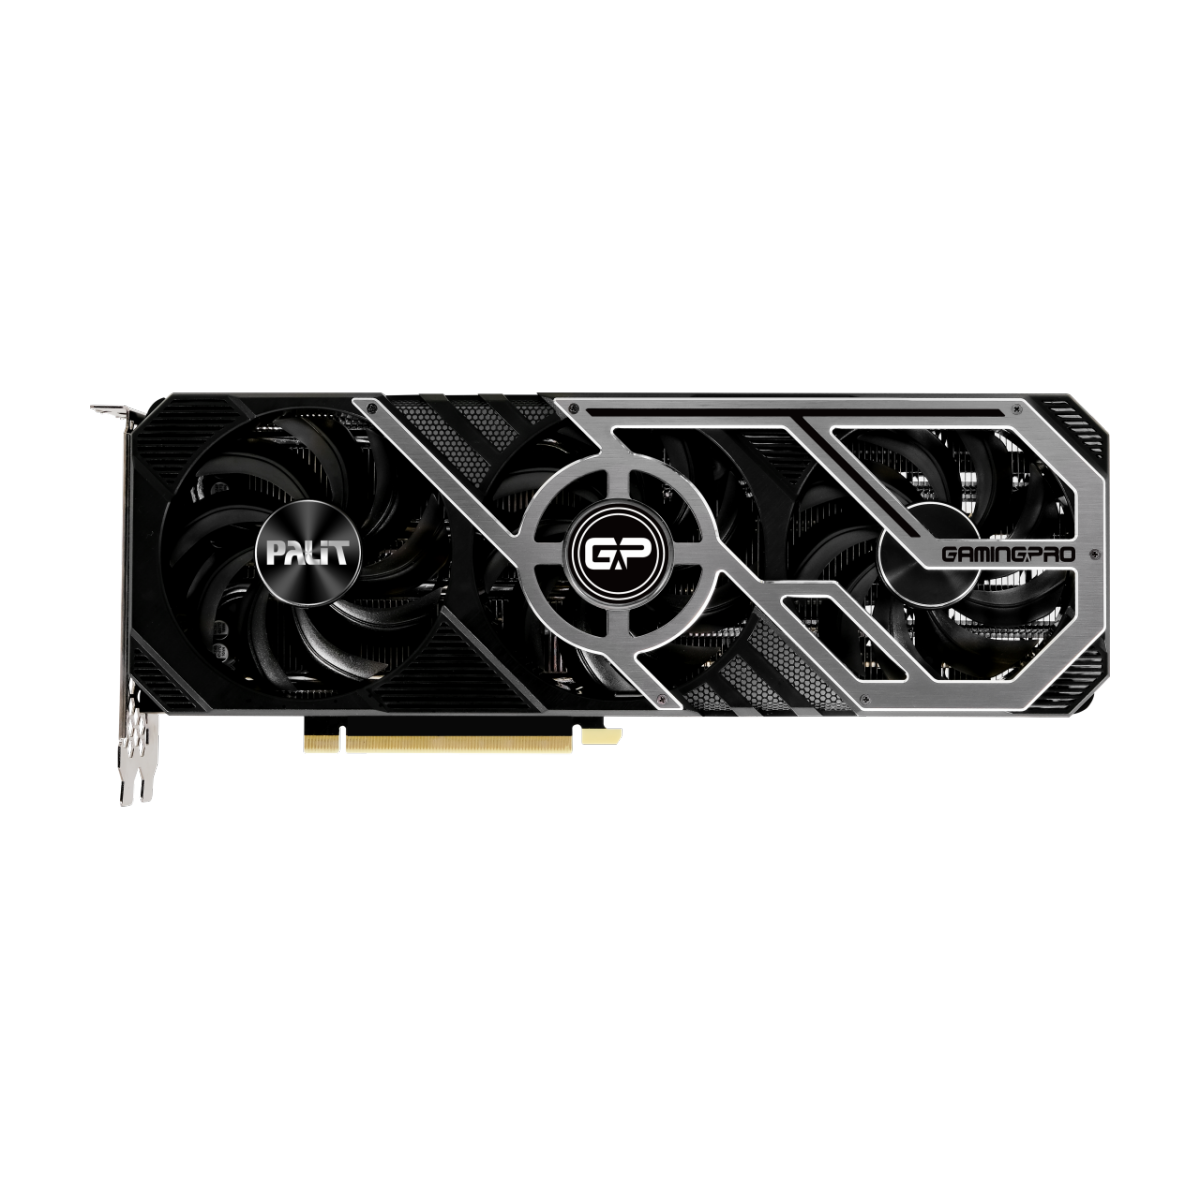 Placa de Vídeo Palit NVIDIA GeForce RTX 3090 GamingPro, 24GB, GDDR6X, 384bit, NED3090019SB-132BA